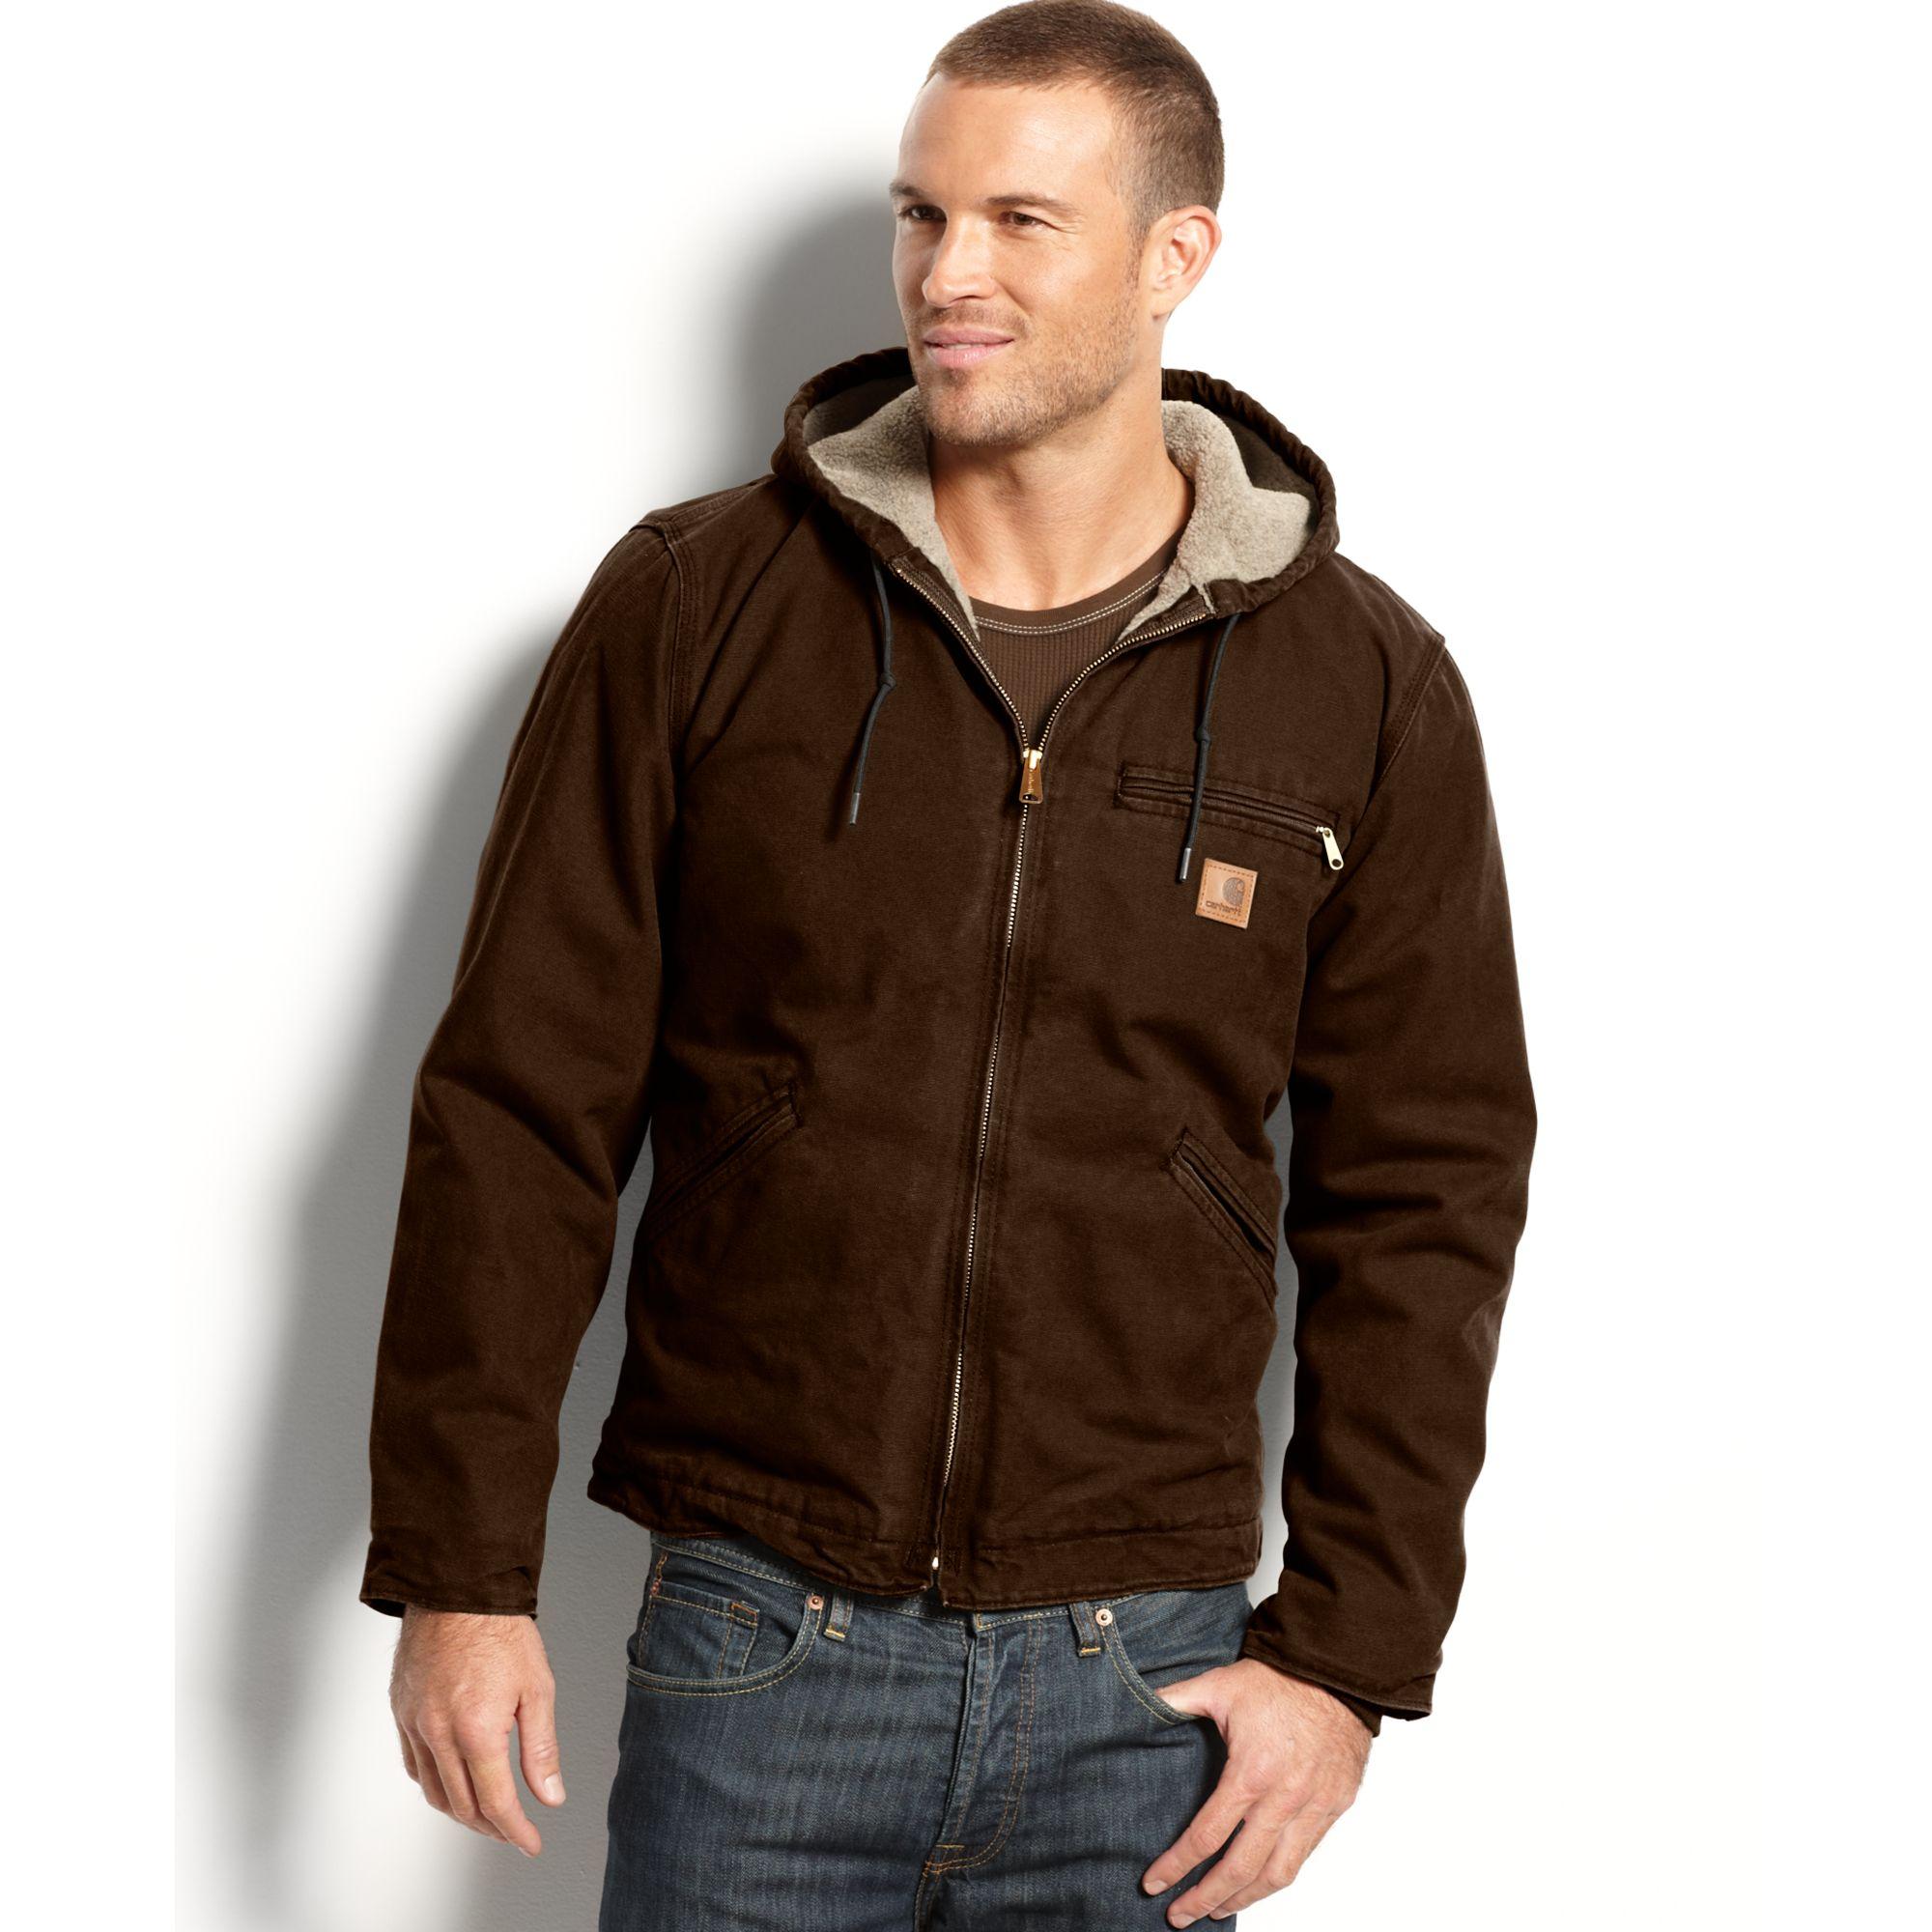 Womens dark brown carhartt jacket